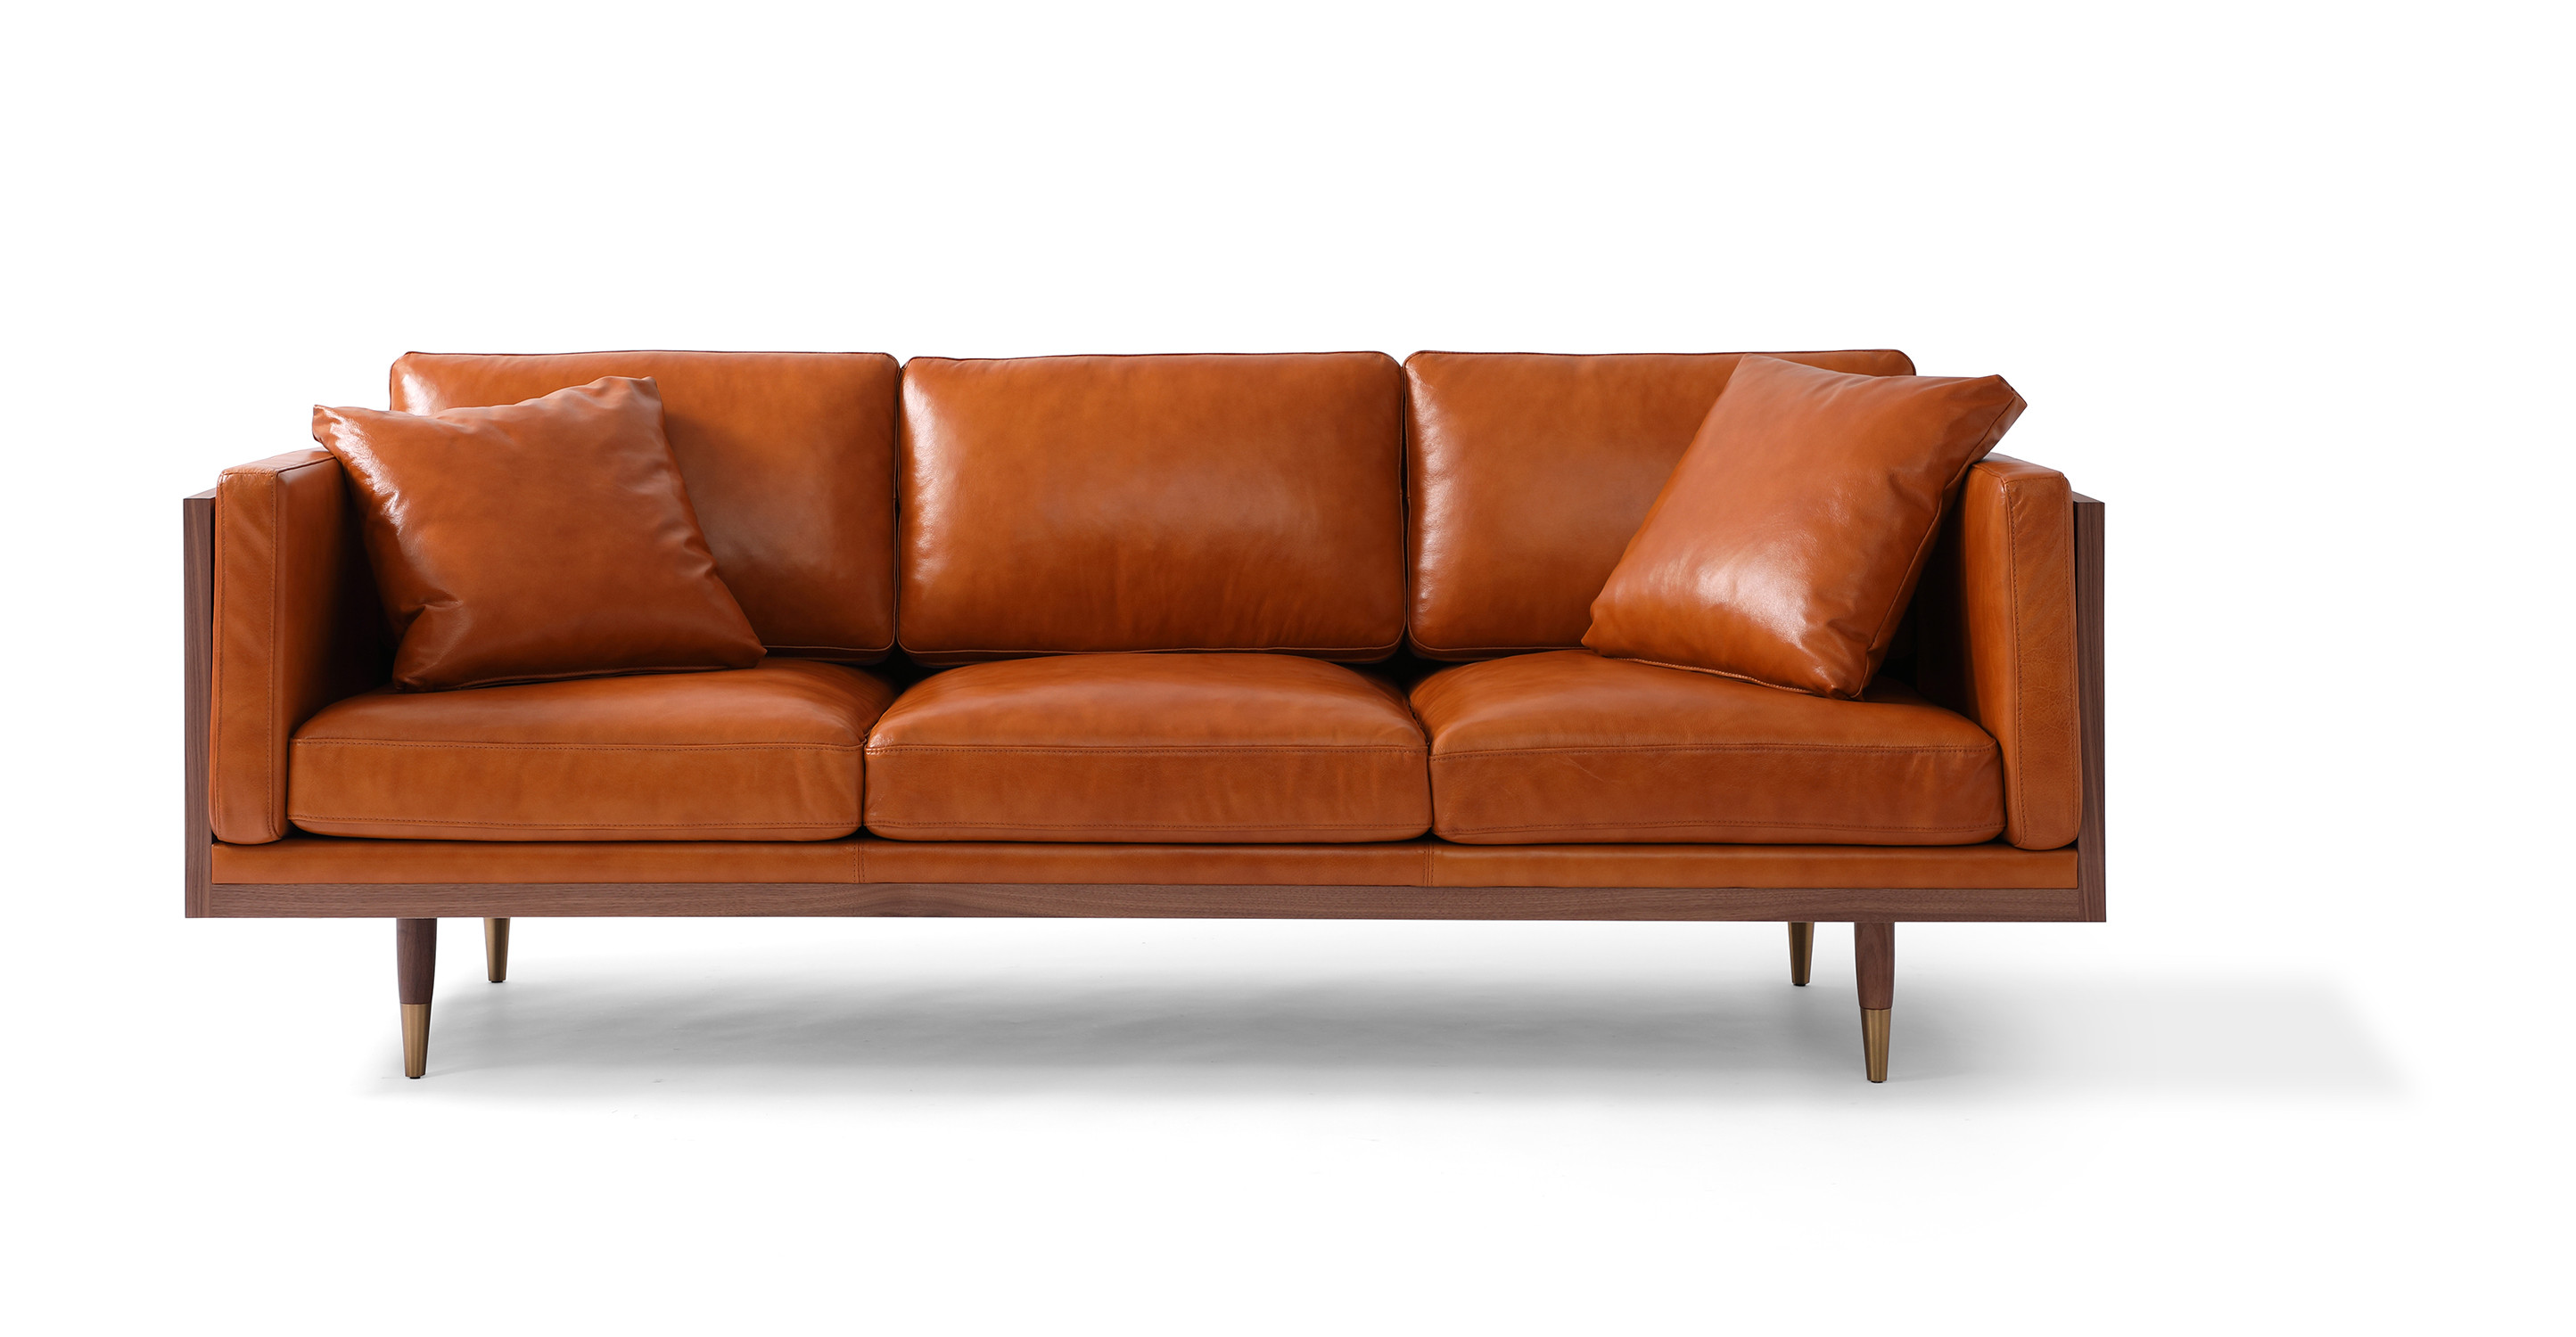 "Woodrow Lush 87"" Leather Sofa, Walnut/Tan Aniline"